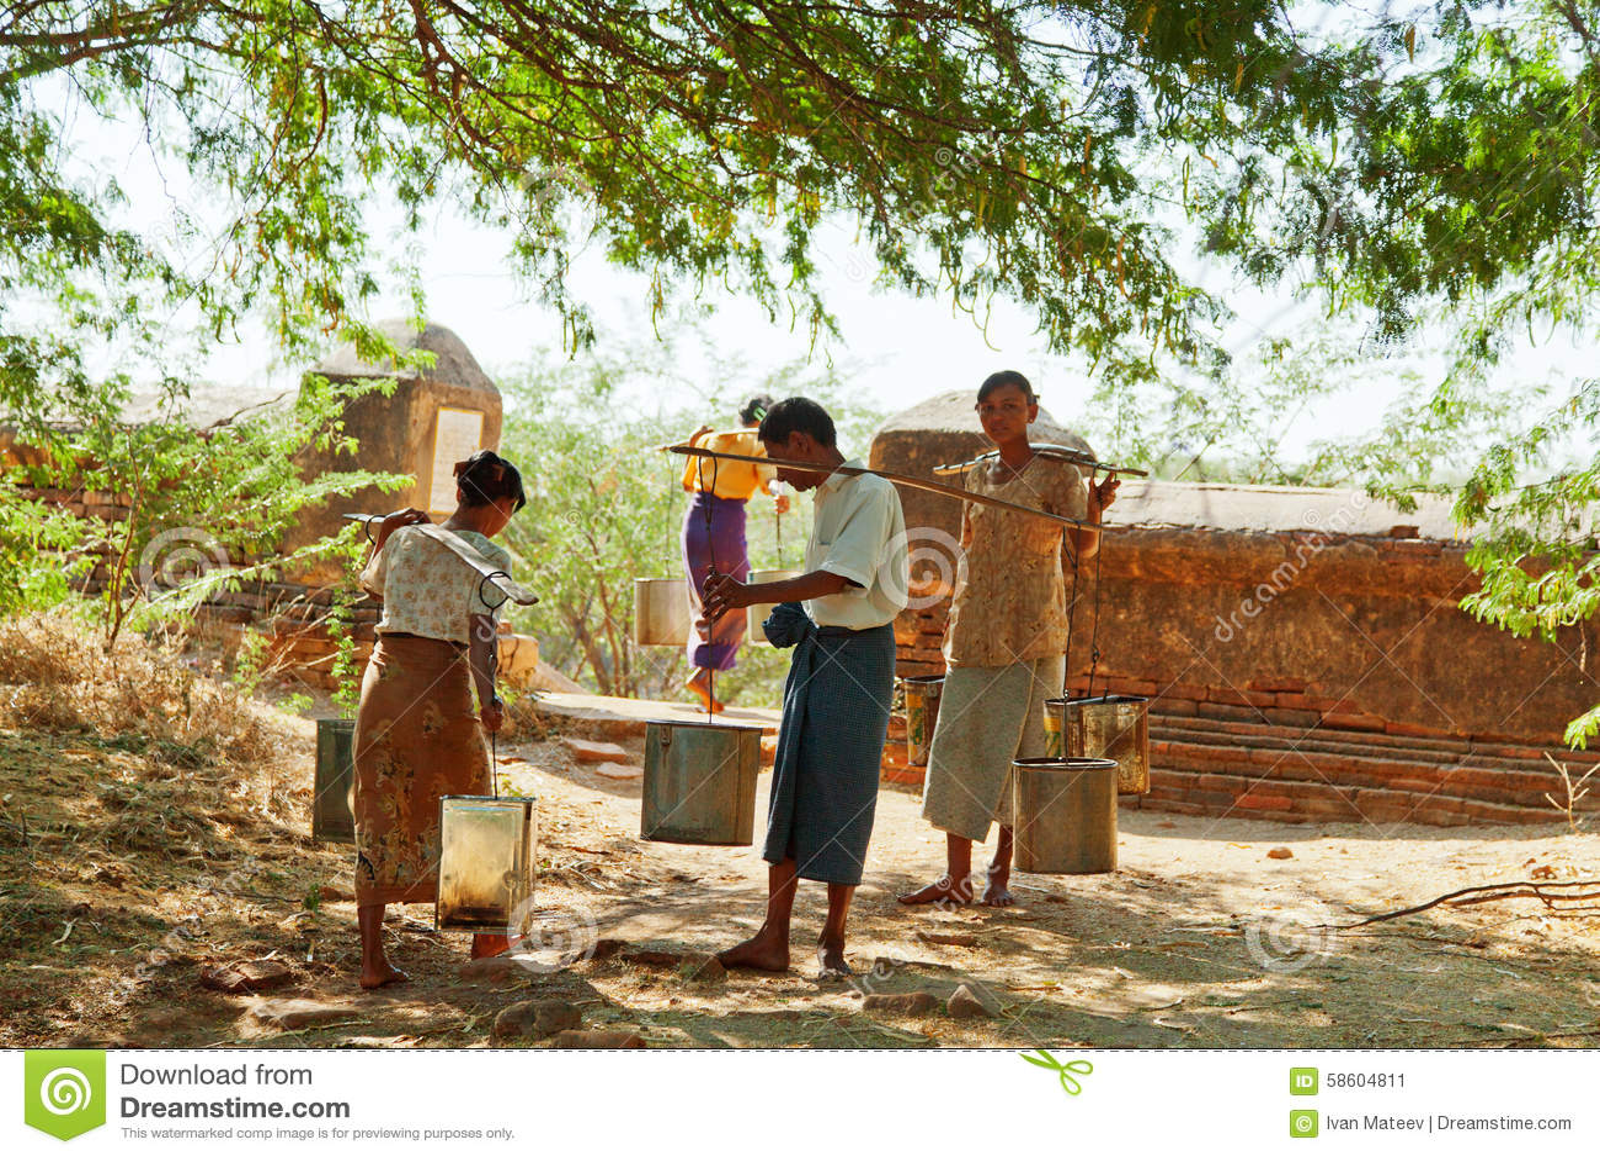 Lifestyle in Bagan, Myanmar